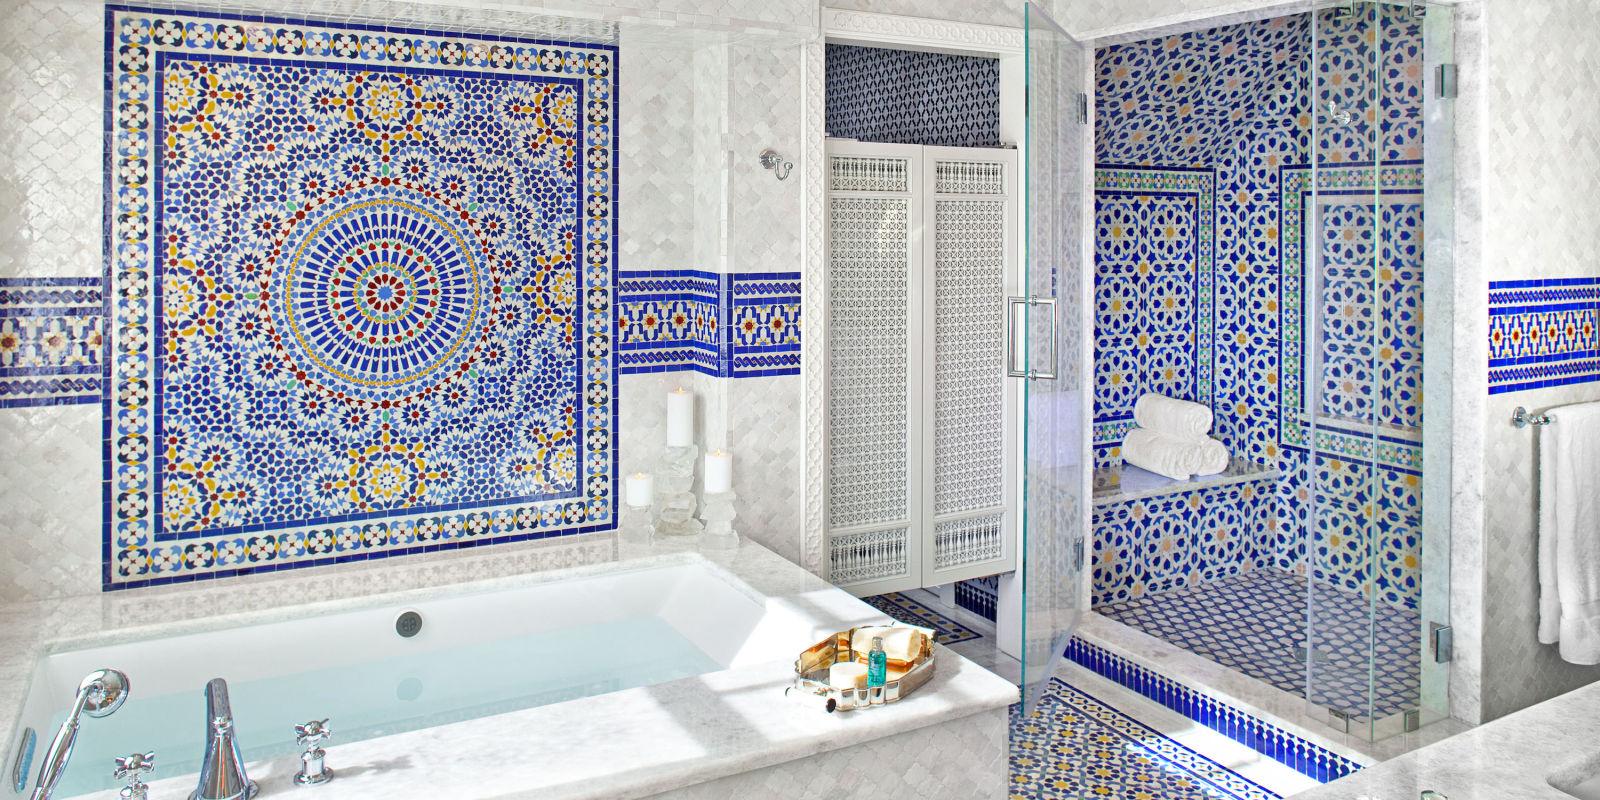 45 Bathroom Tile Design Ideas